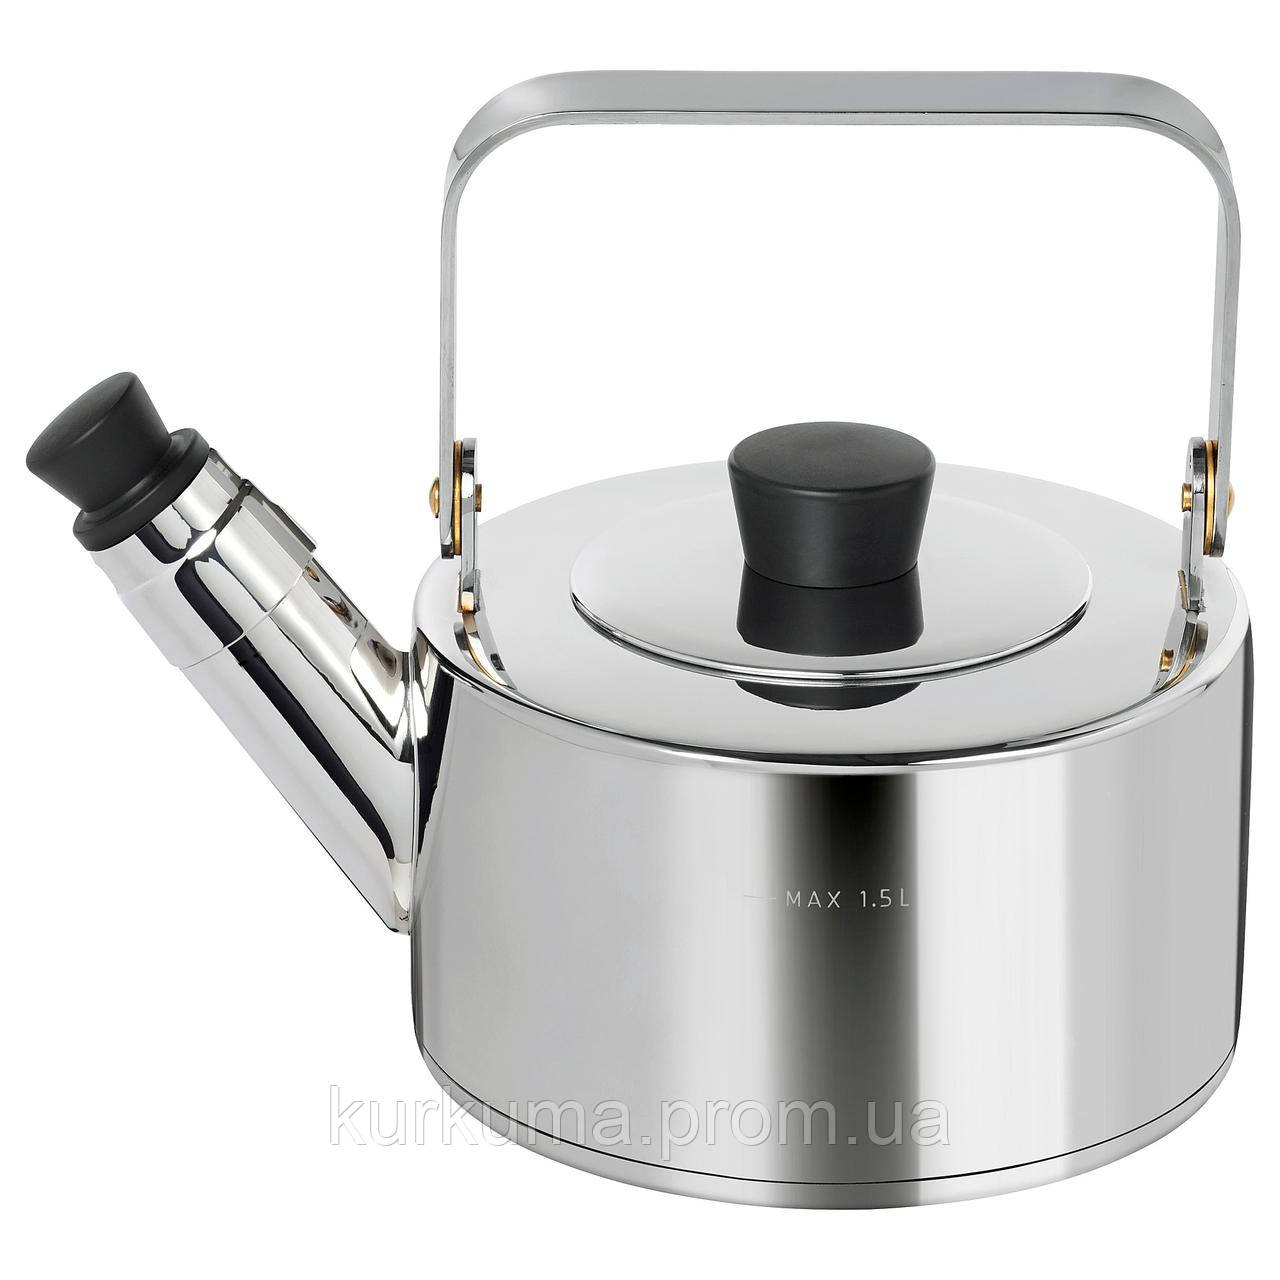 IKEA METALLISK Чайник, нержавеющая сталь  (403.602.22)